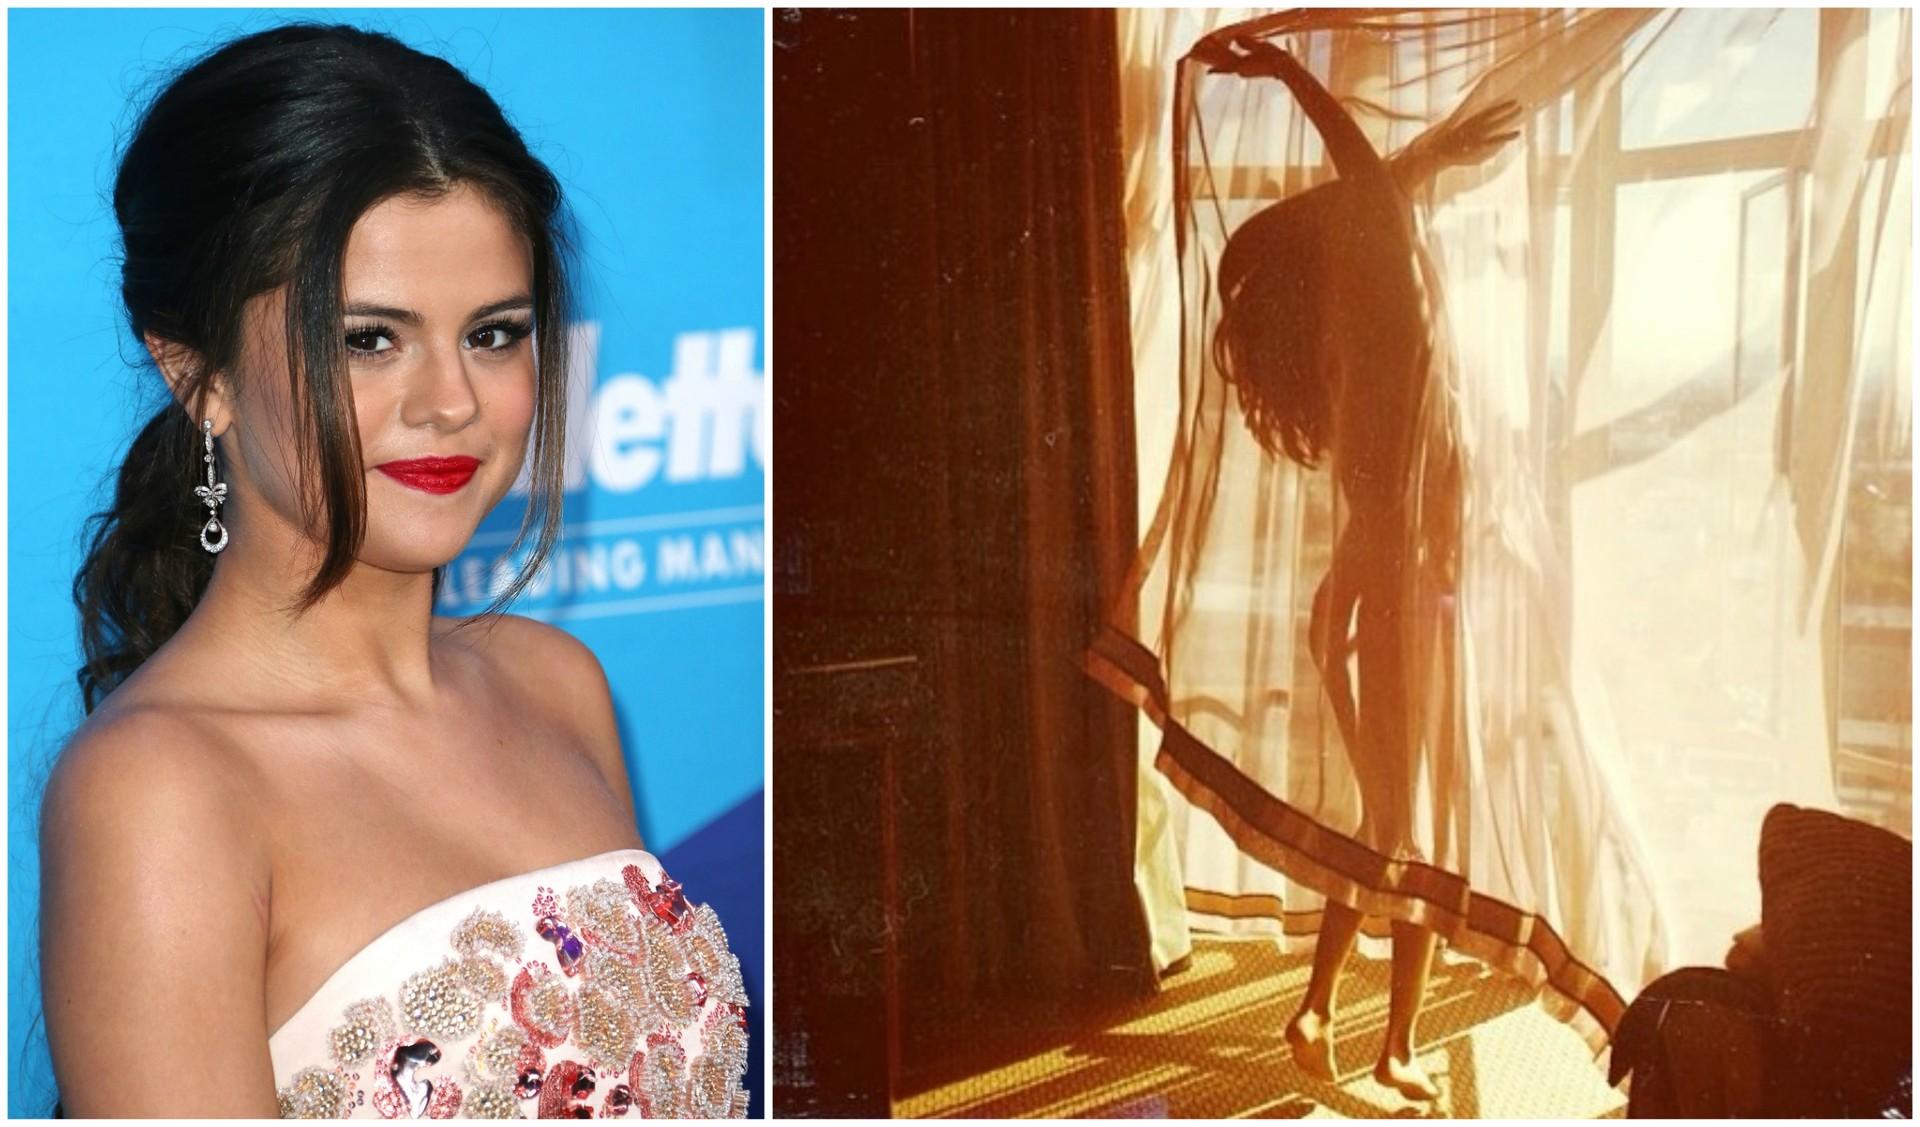 Selena Gomez E Sua Foto Sem Nenhuma Roupa Getty Images